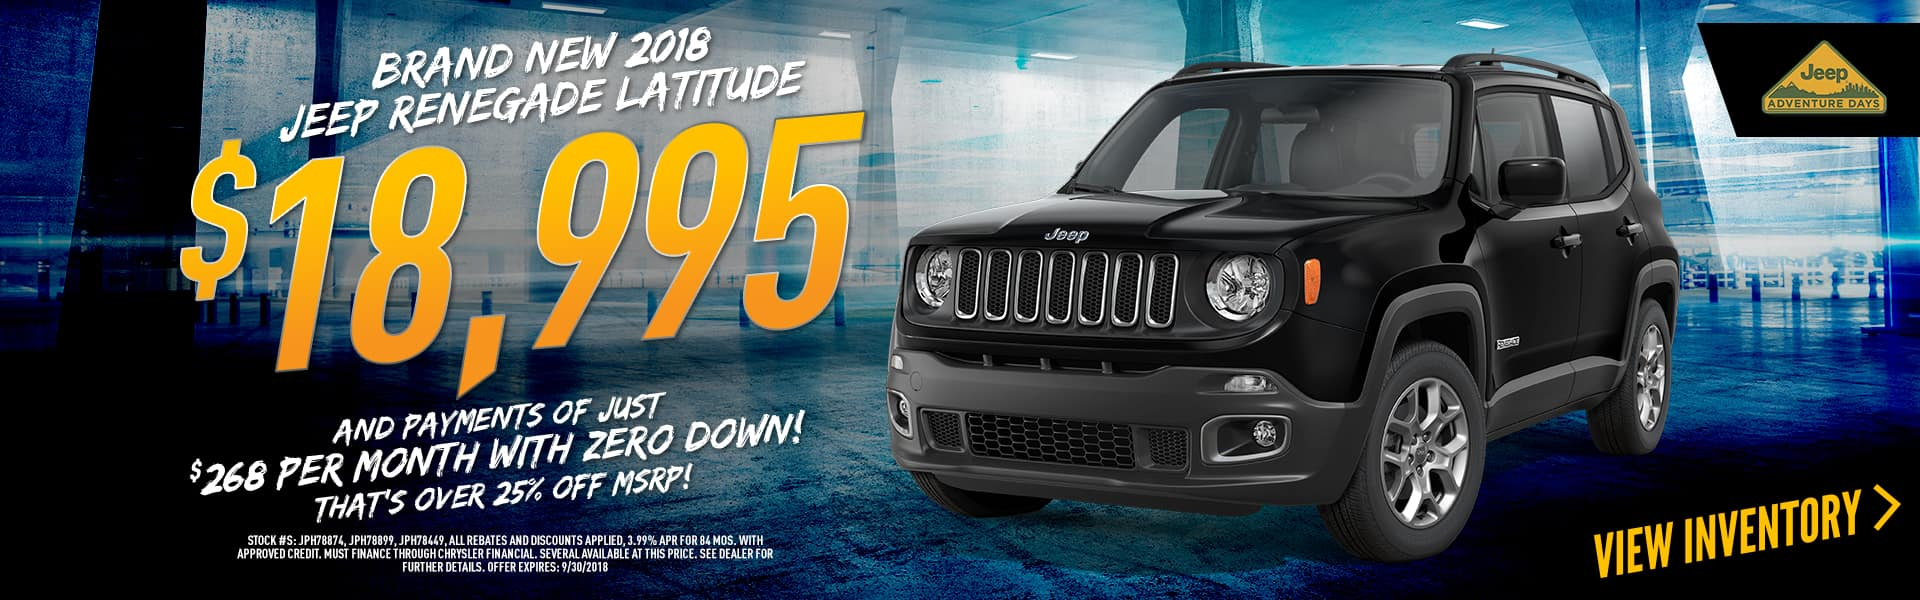 2018-jeep-renegade-latitude-oklahoma-city